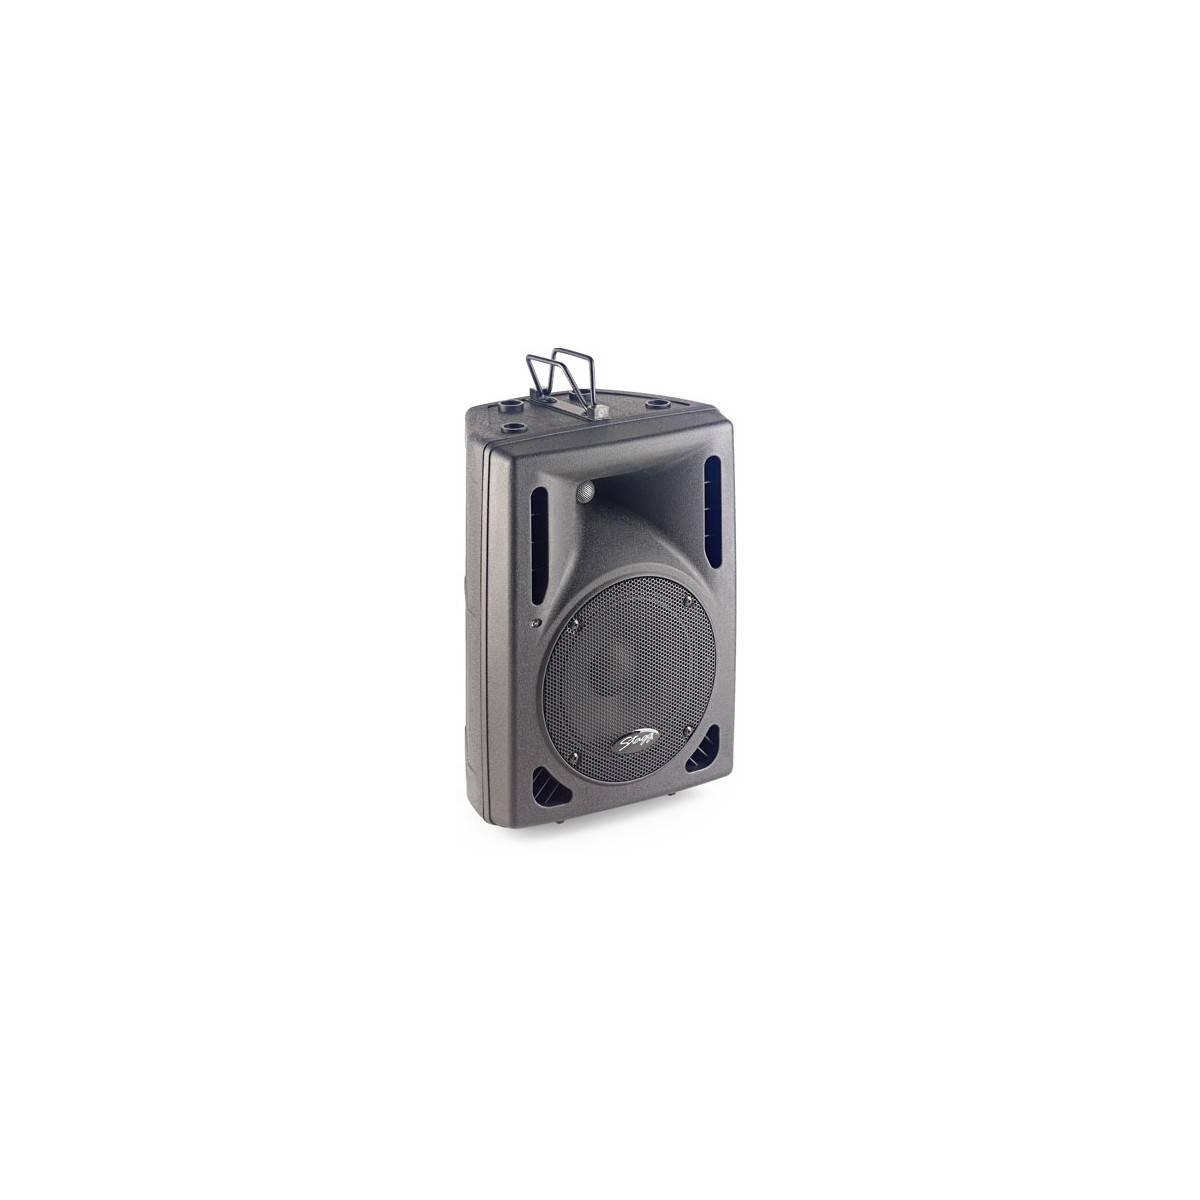 stagg enceinte bi amplifi e 90w sonorisation noizikidz. Black Bedroom Furniture Sets. Home Design Ideas